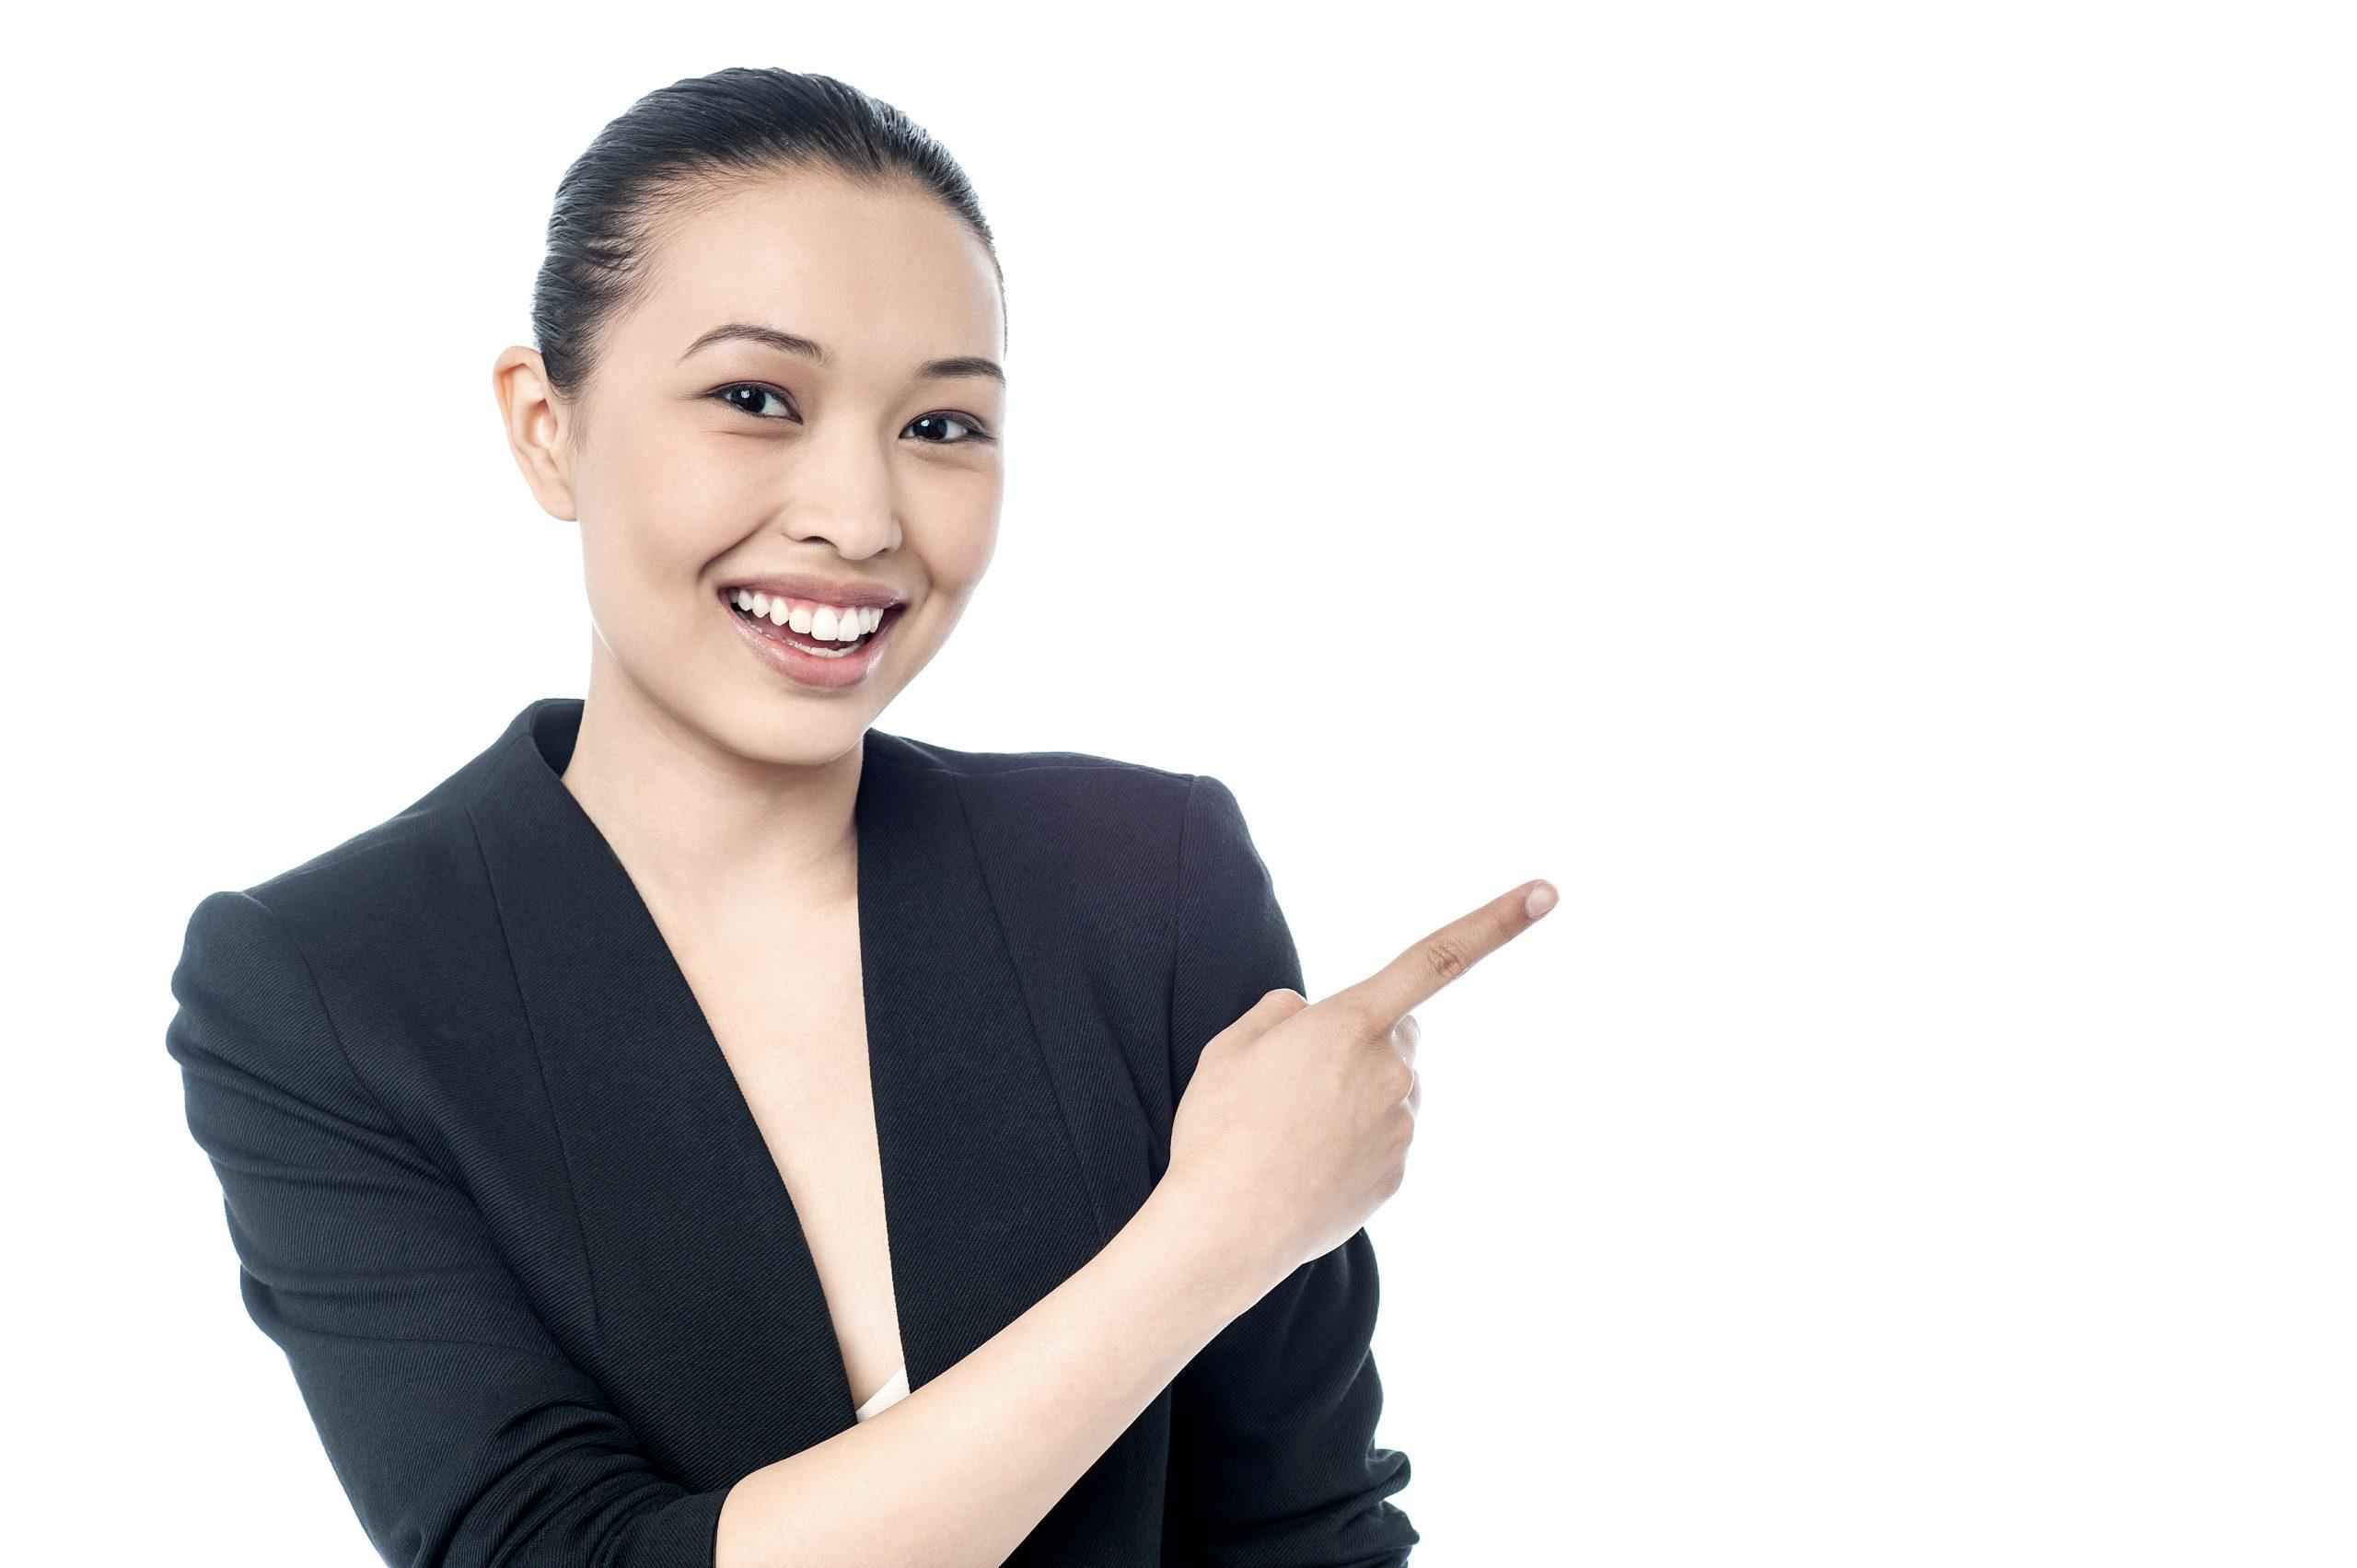 84808740_xl-female-business-executive